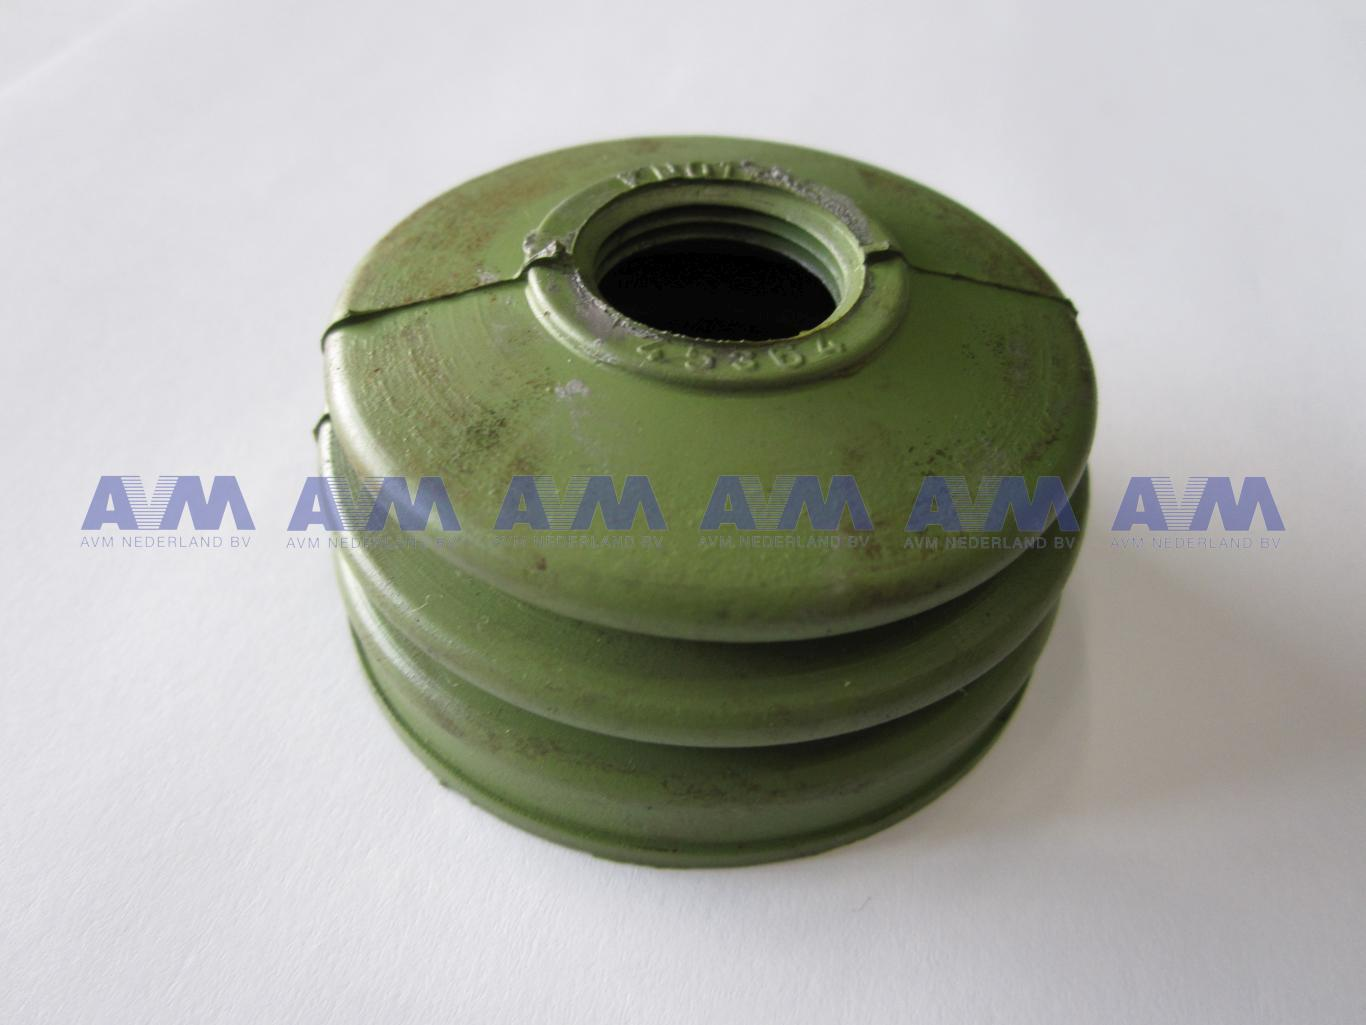 Stofhoes Knott groen NT 102213 Knott